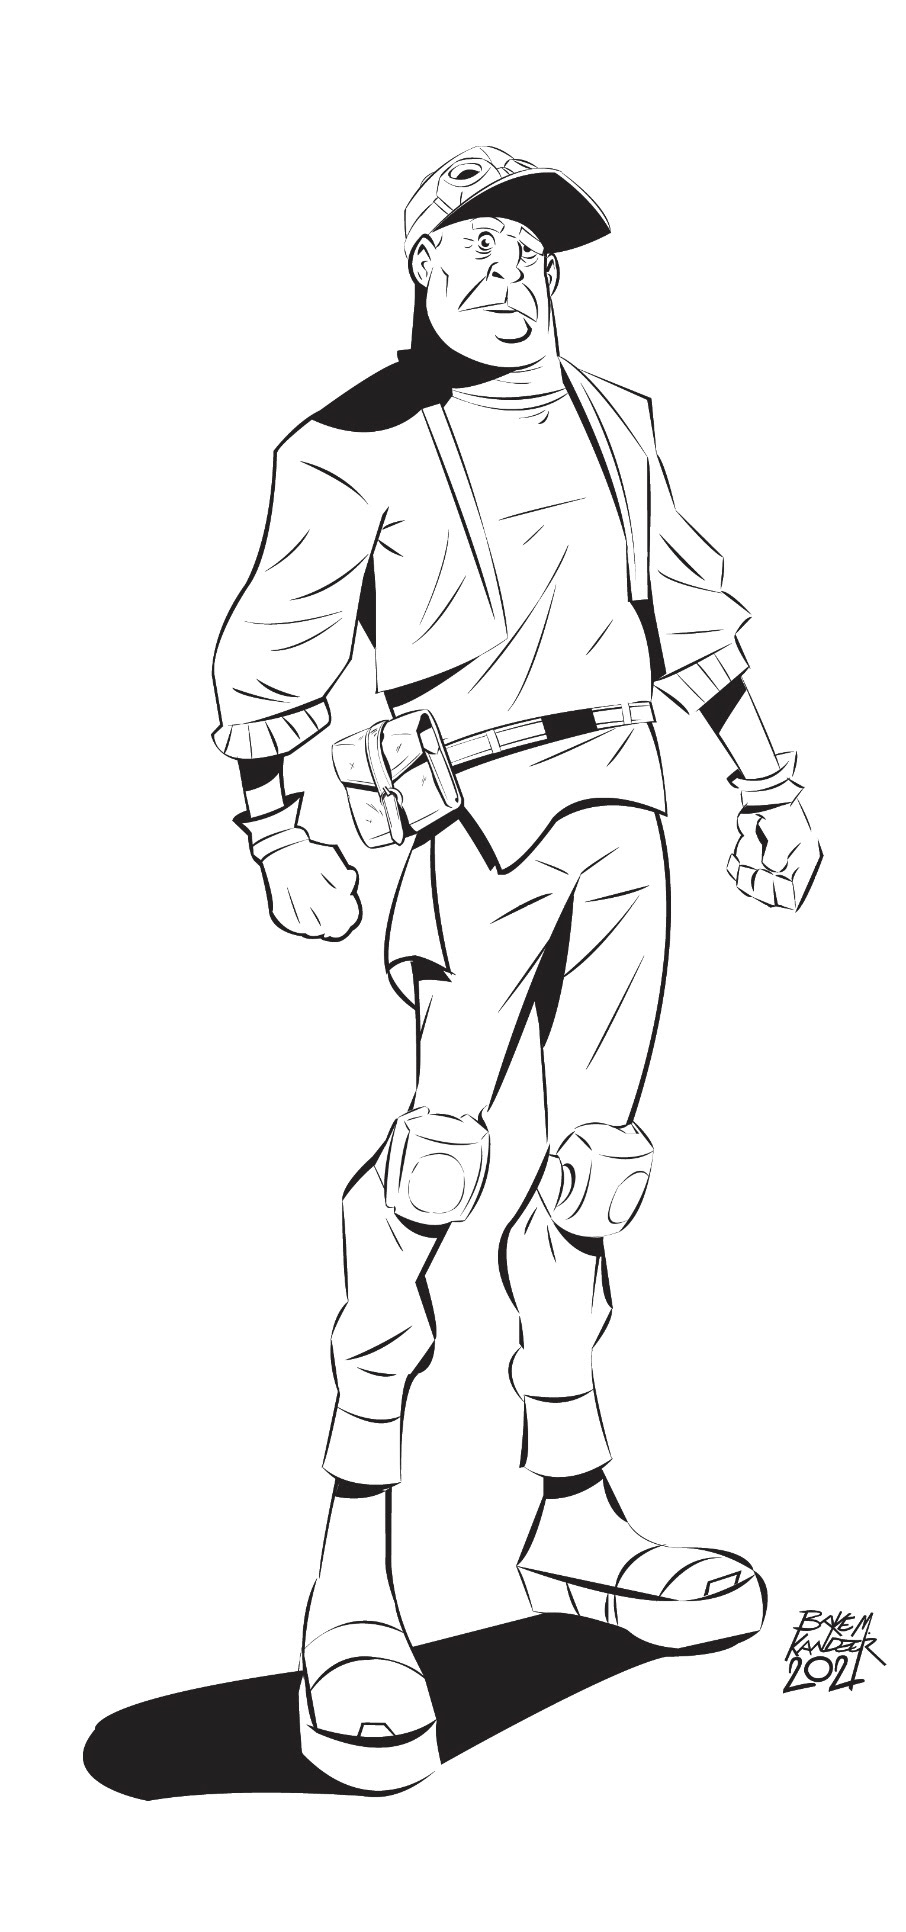 Character Character design  comic Comic Book ILLUSTRATION